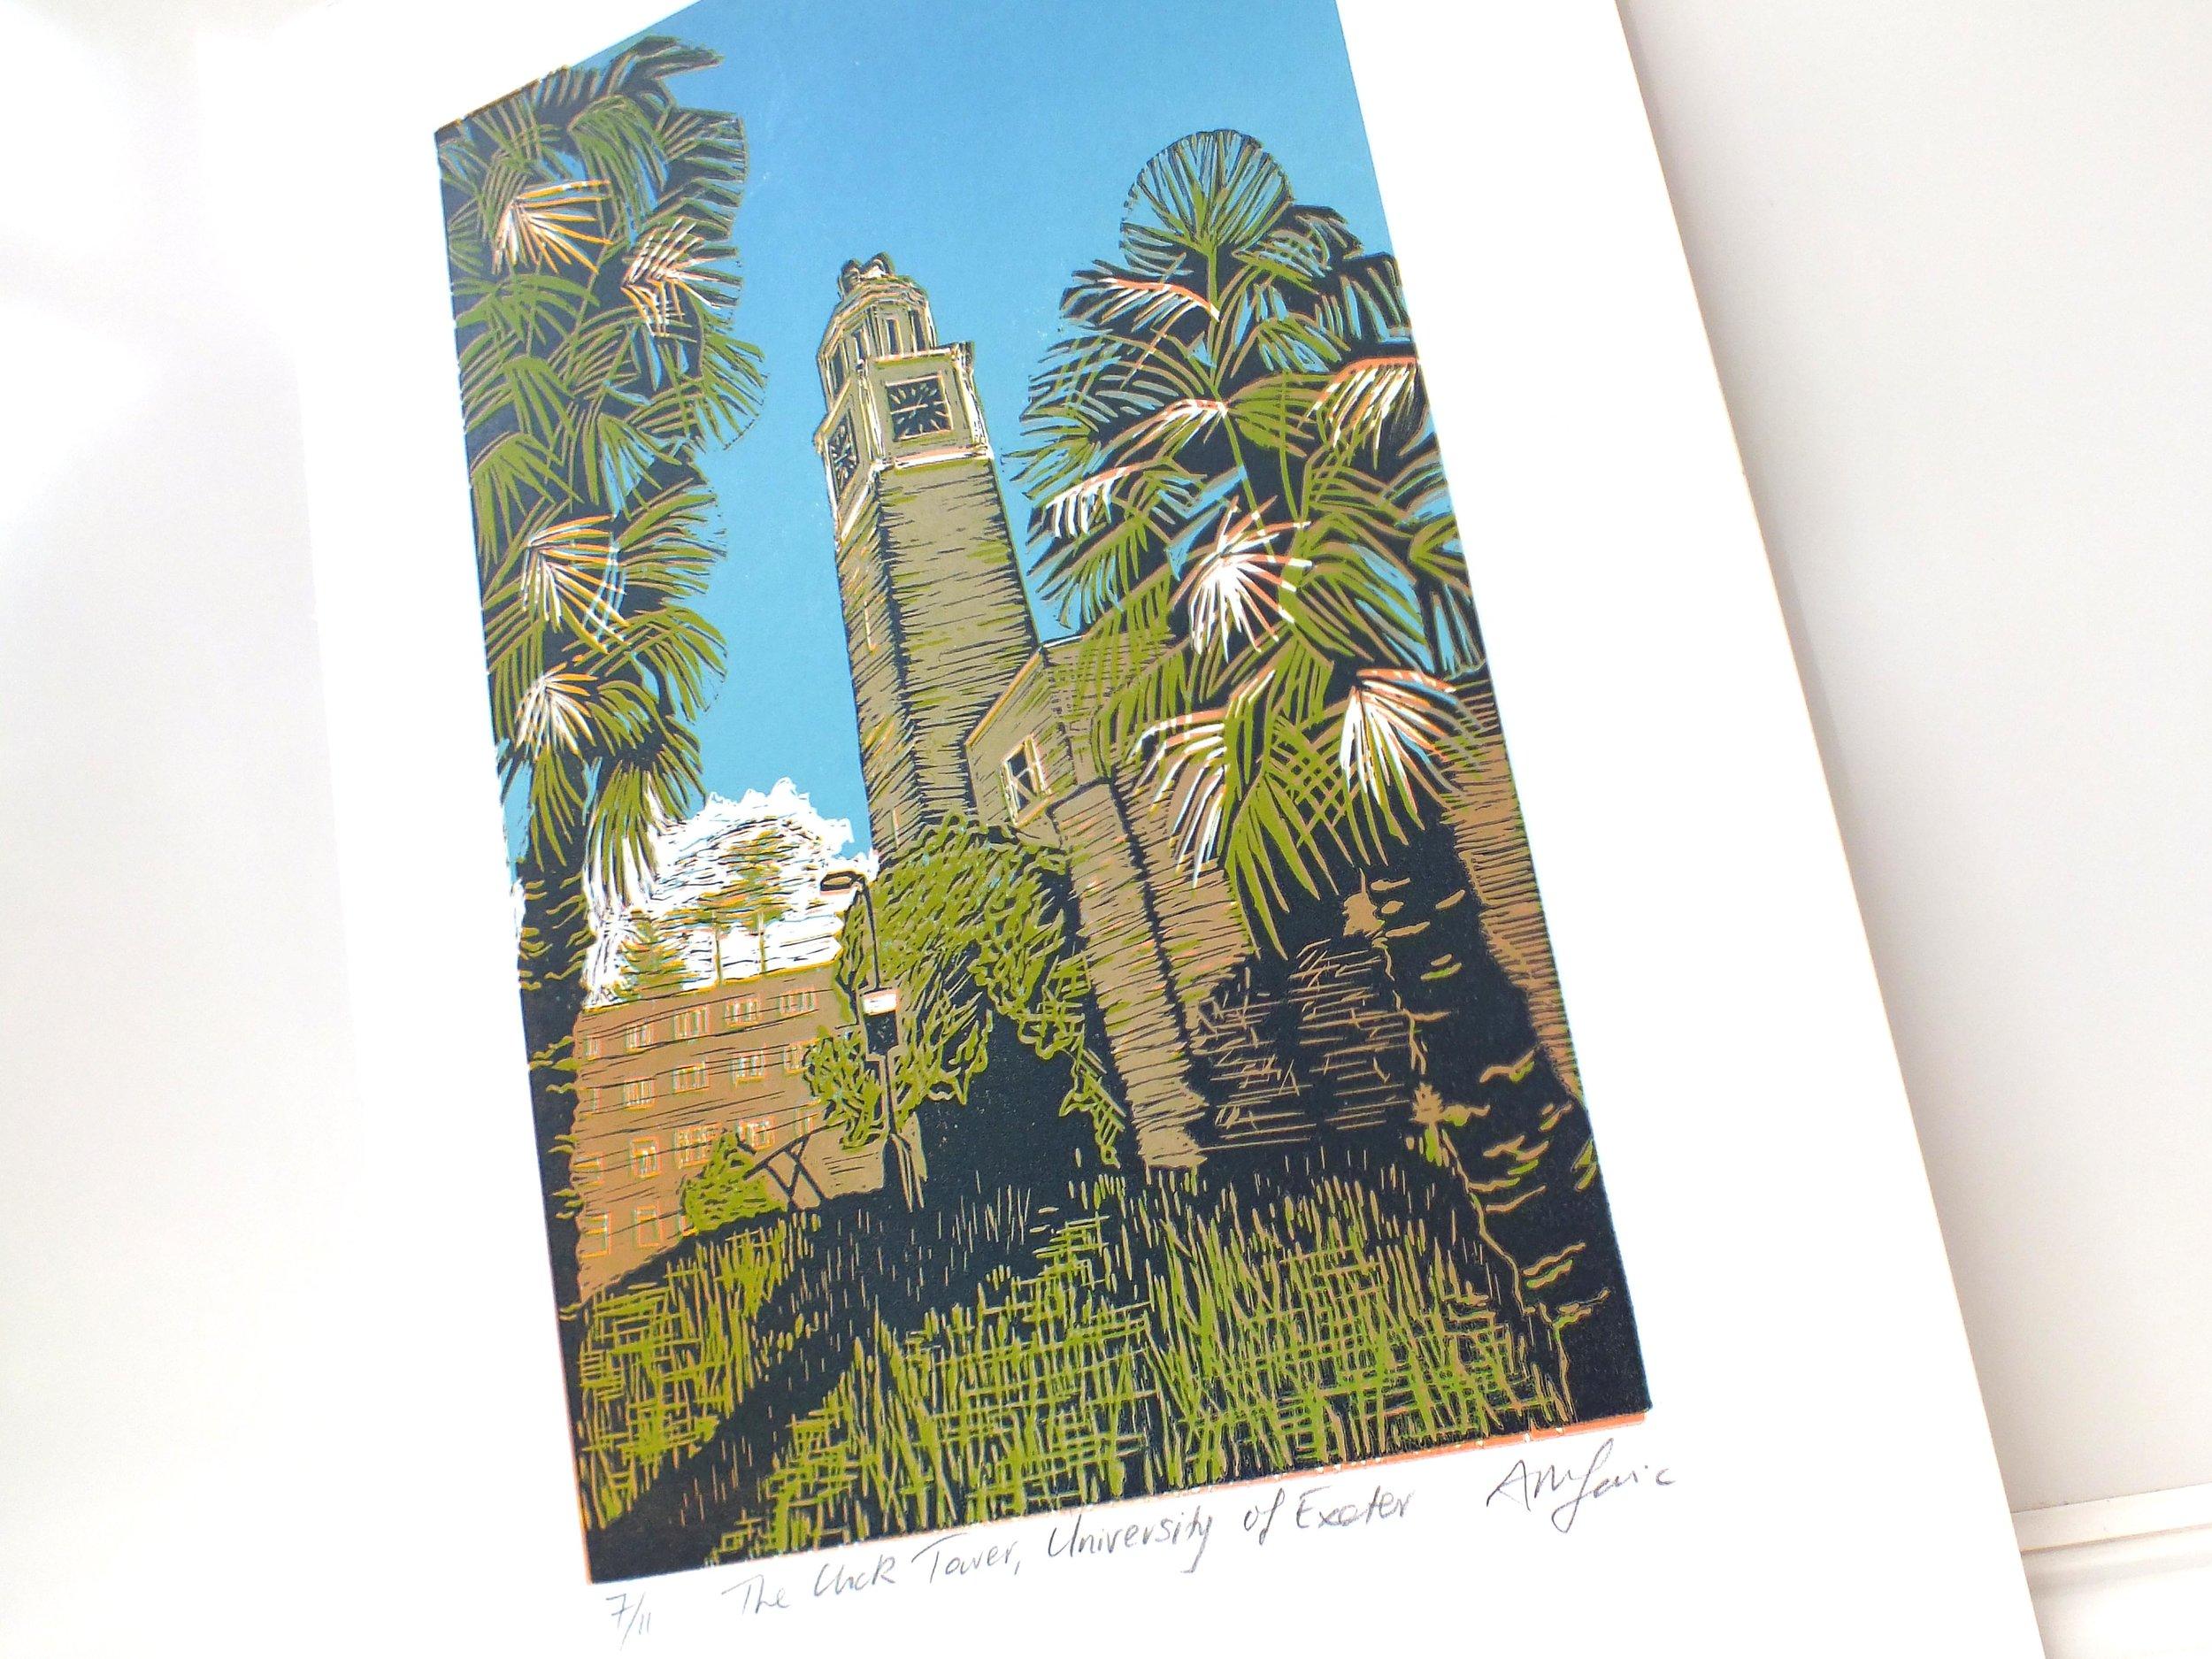 Clock tower lino #7 angled.jpg